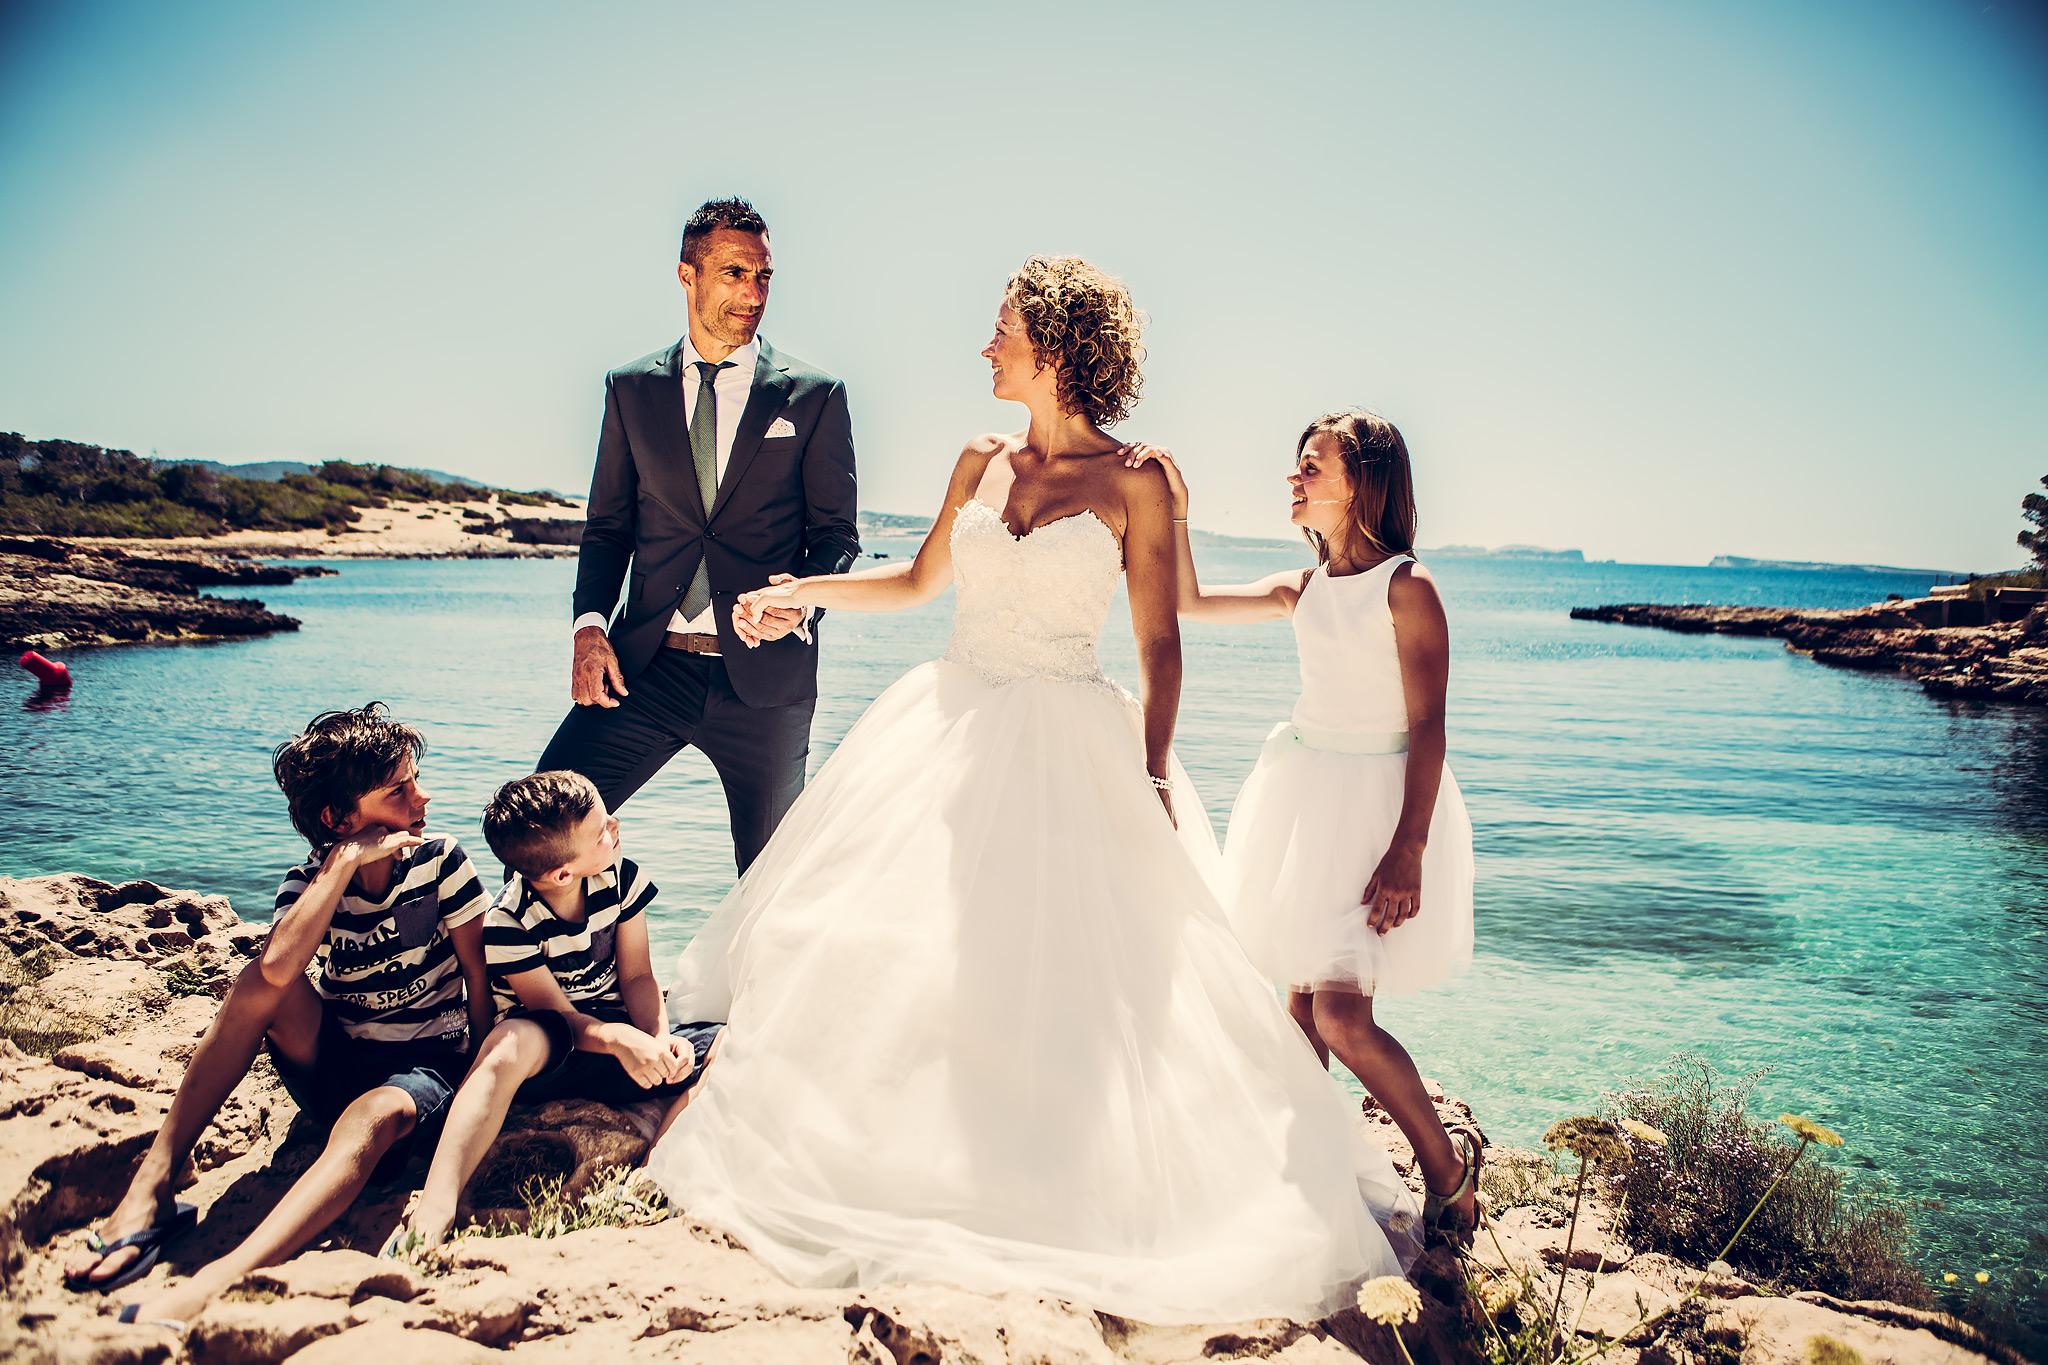 Bruidsreportage Destination Wedding Ibiza Mandy en Joost 016 - Bas Driessen Fotografie